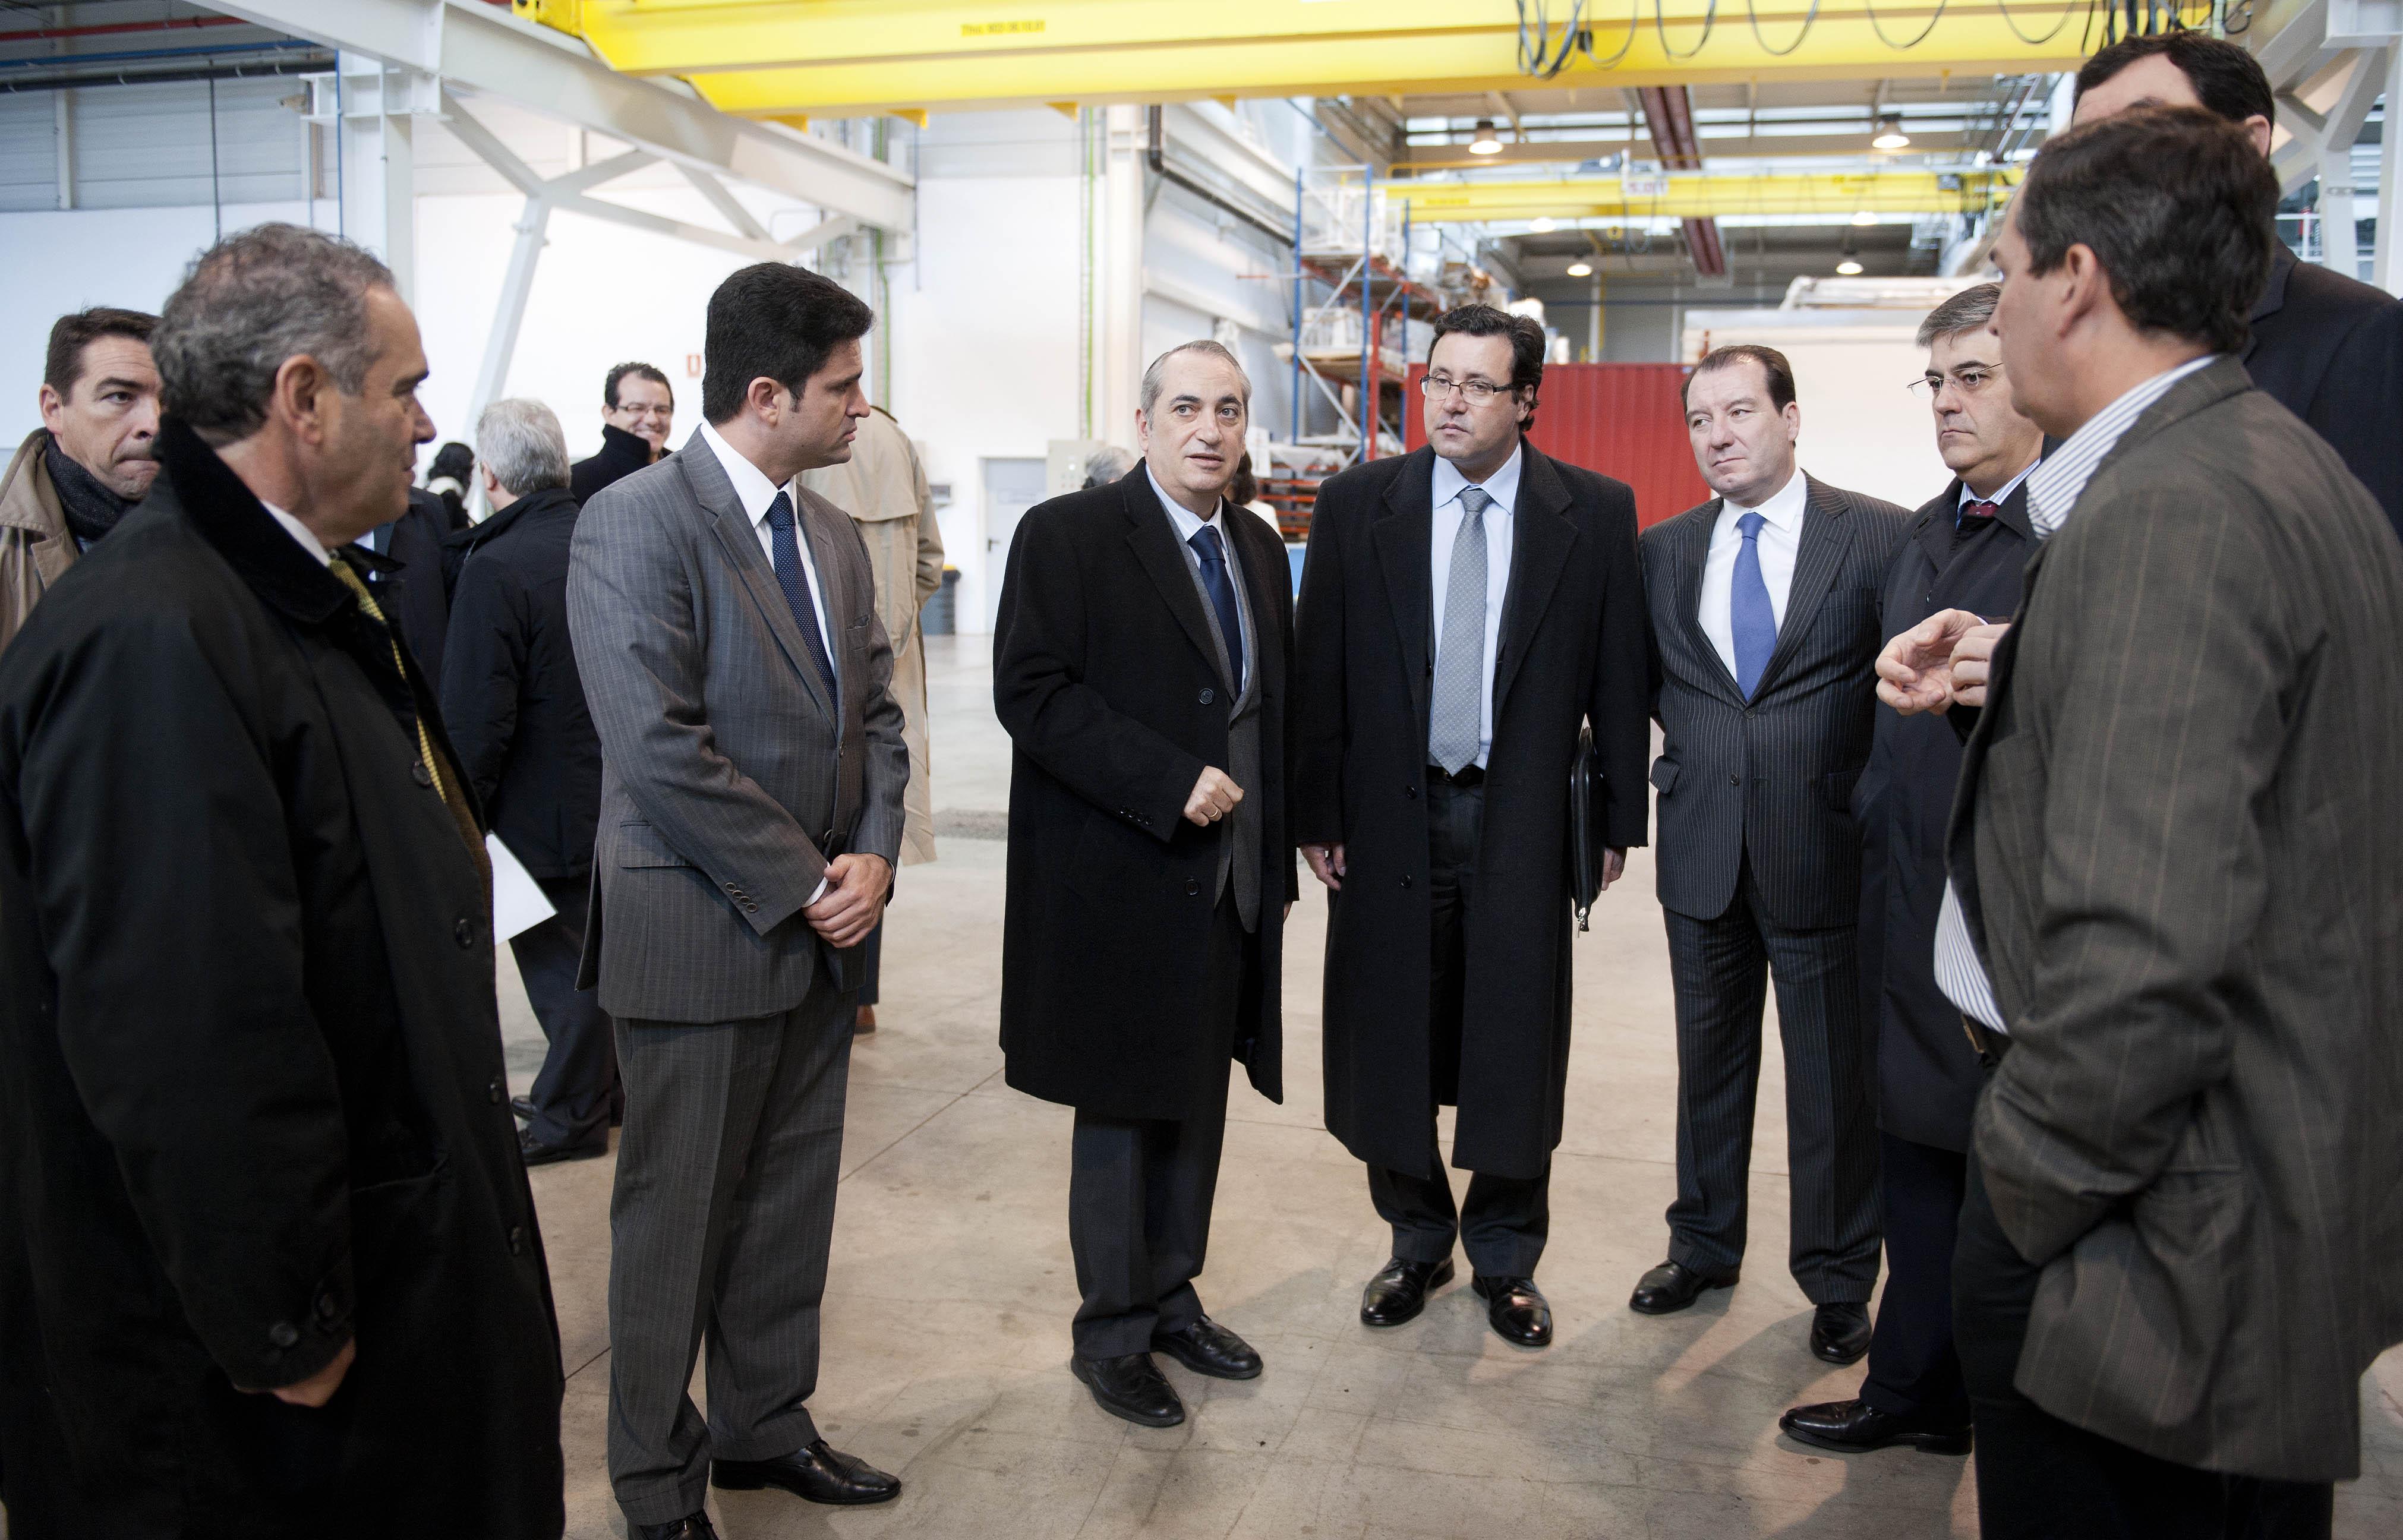 2012_01_20_arriola_metro_delegacion_brasilena6.jpg